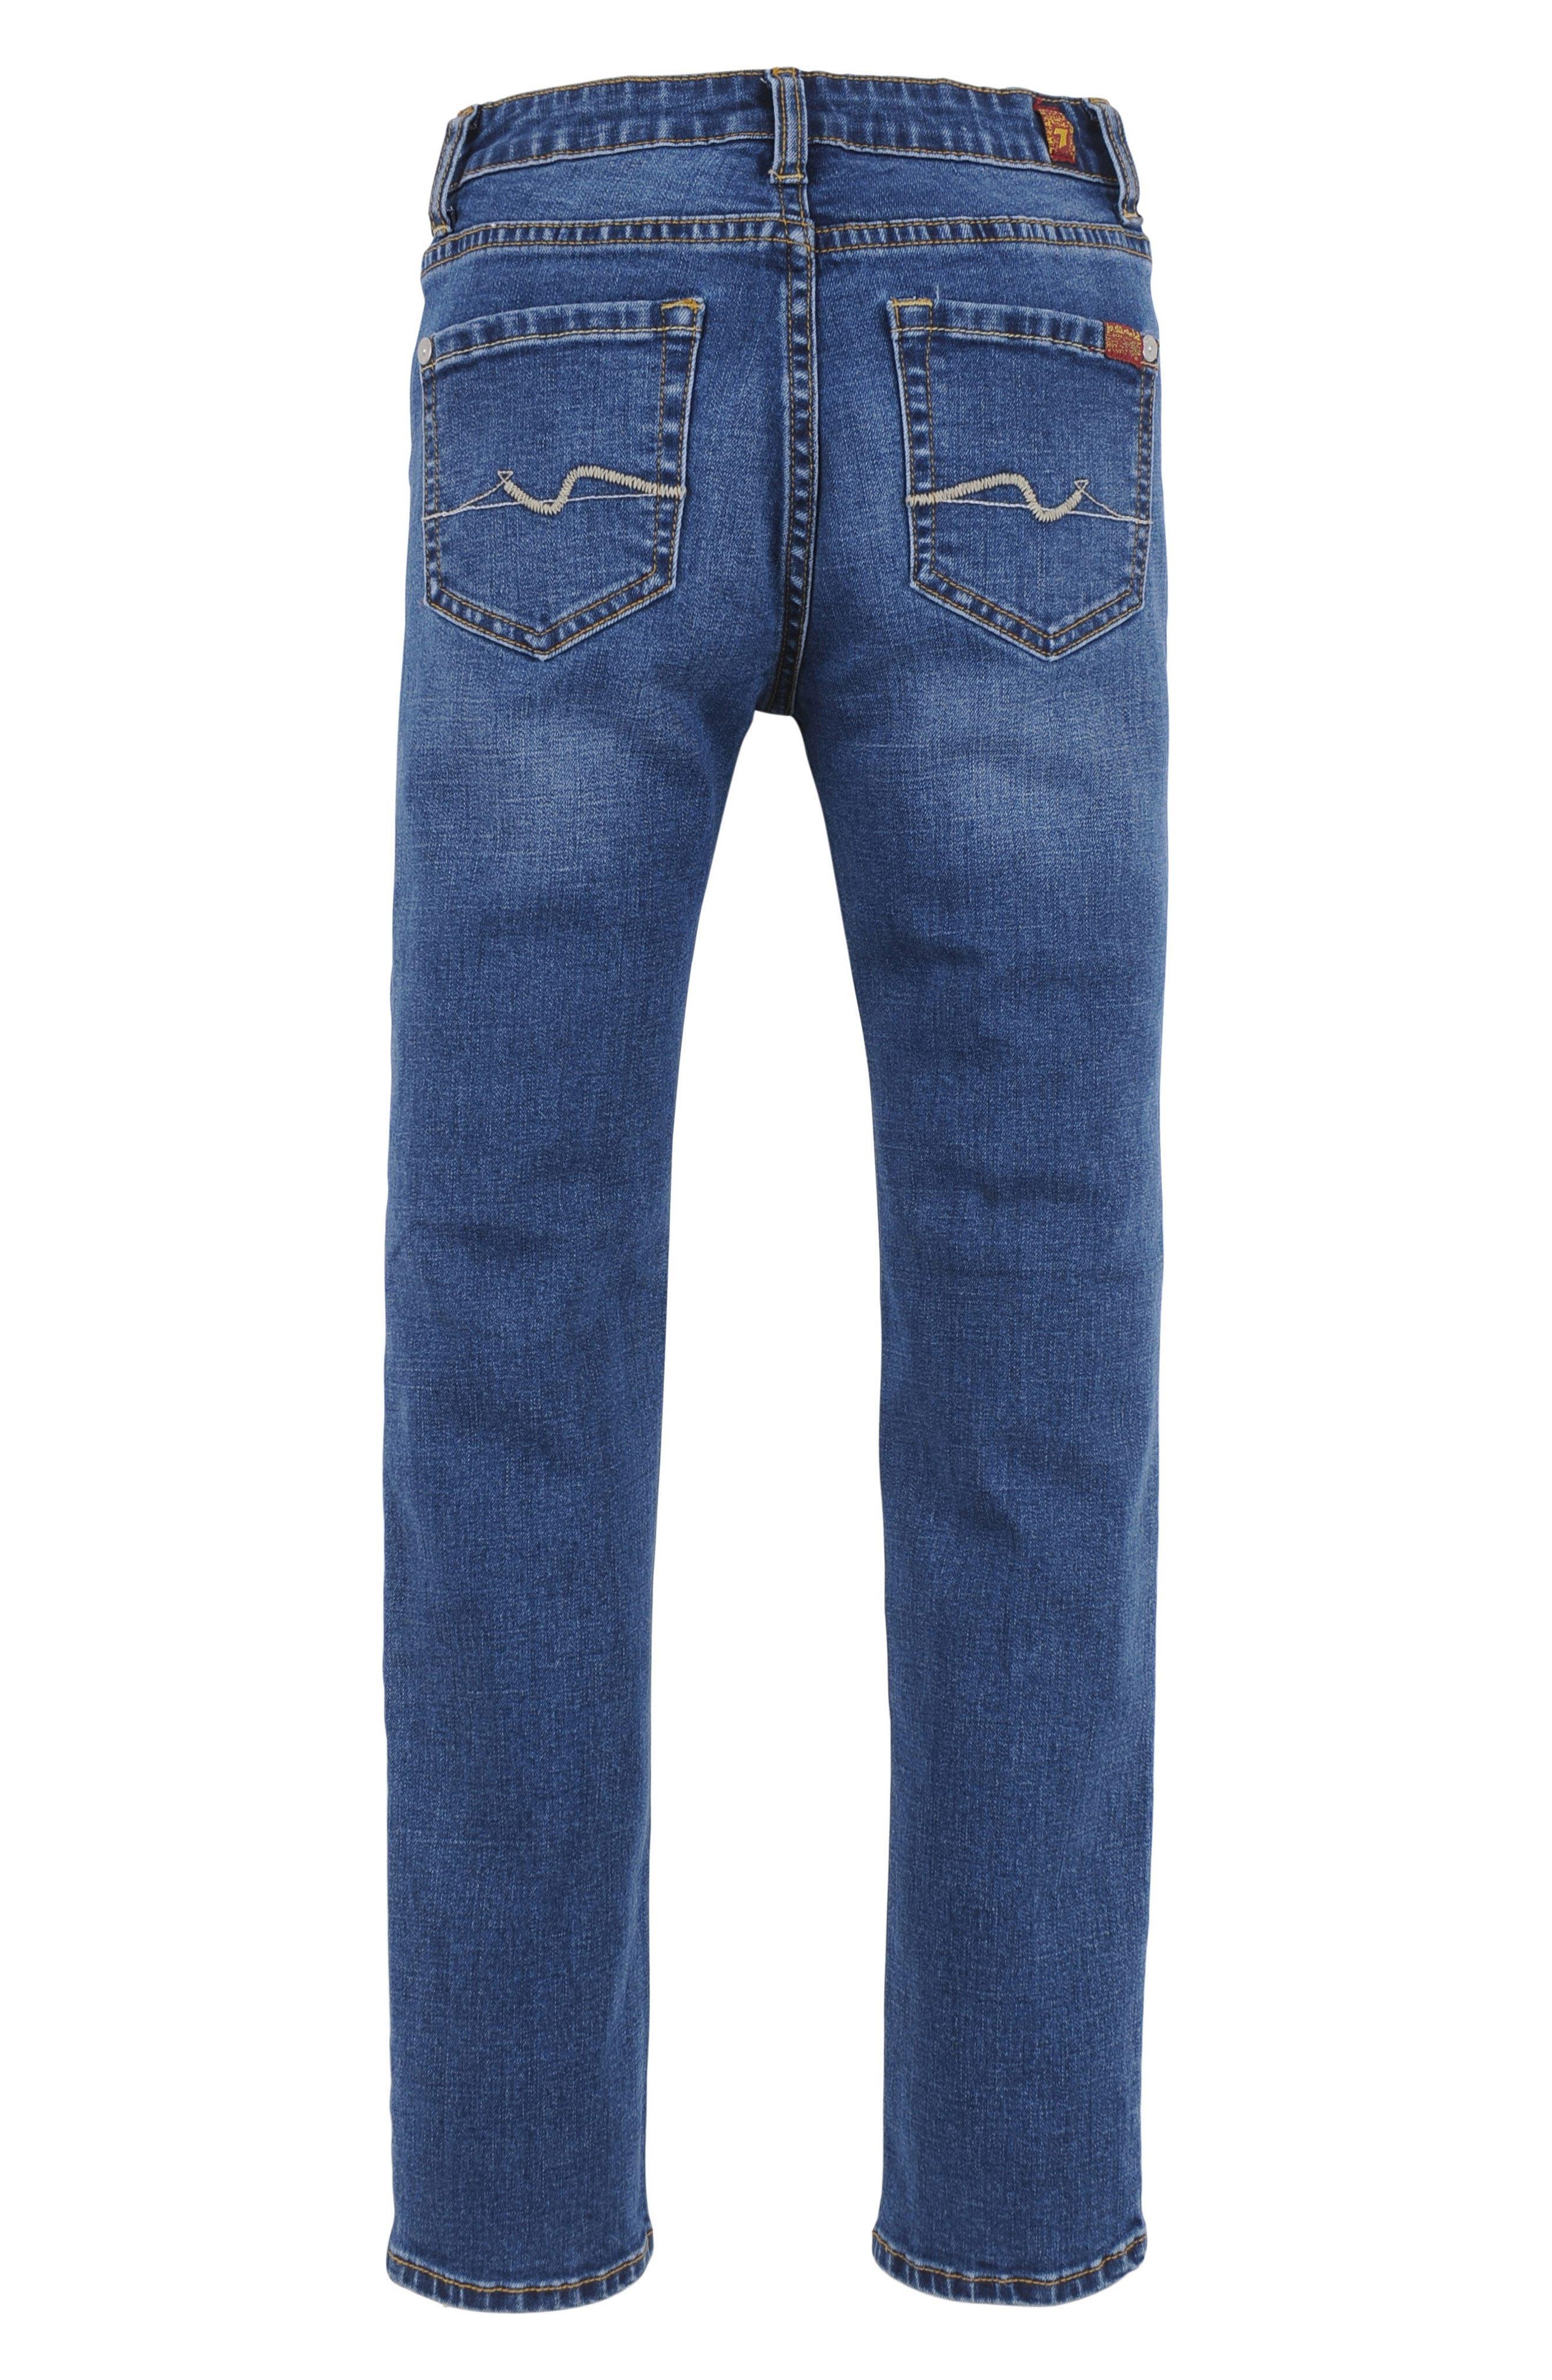 'Slimmy' Jeans,                             Alternate thumbnail 2, color,                             Bristol